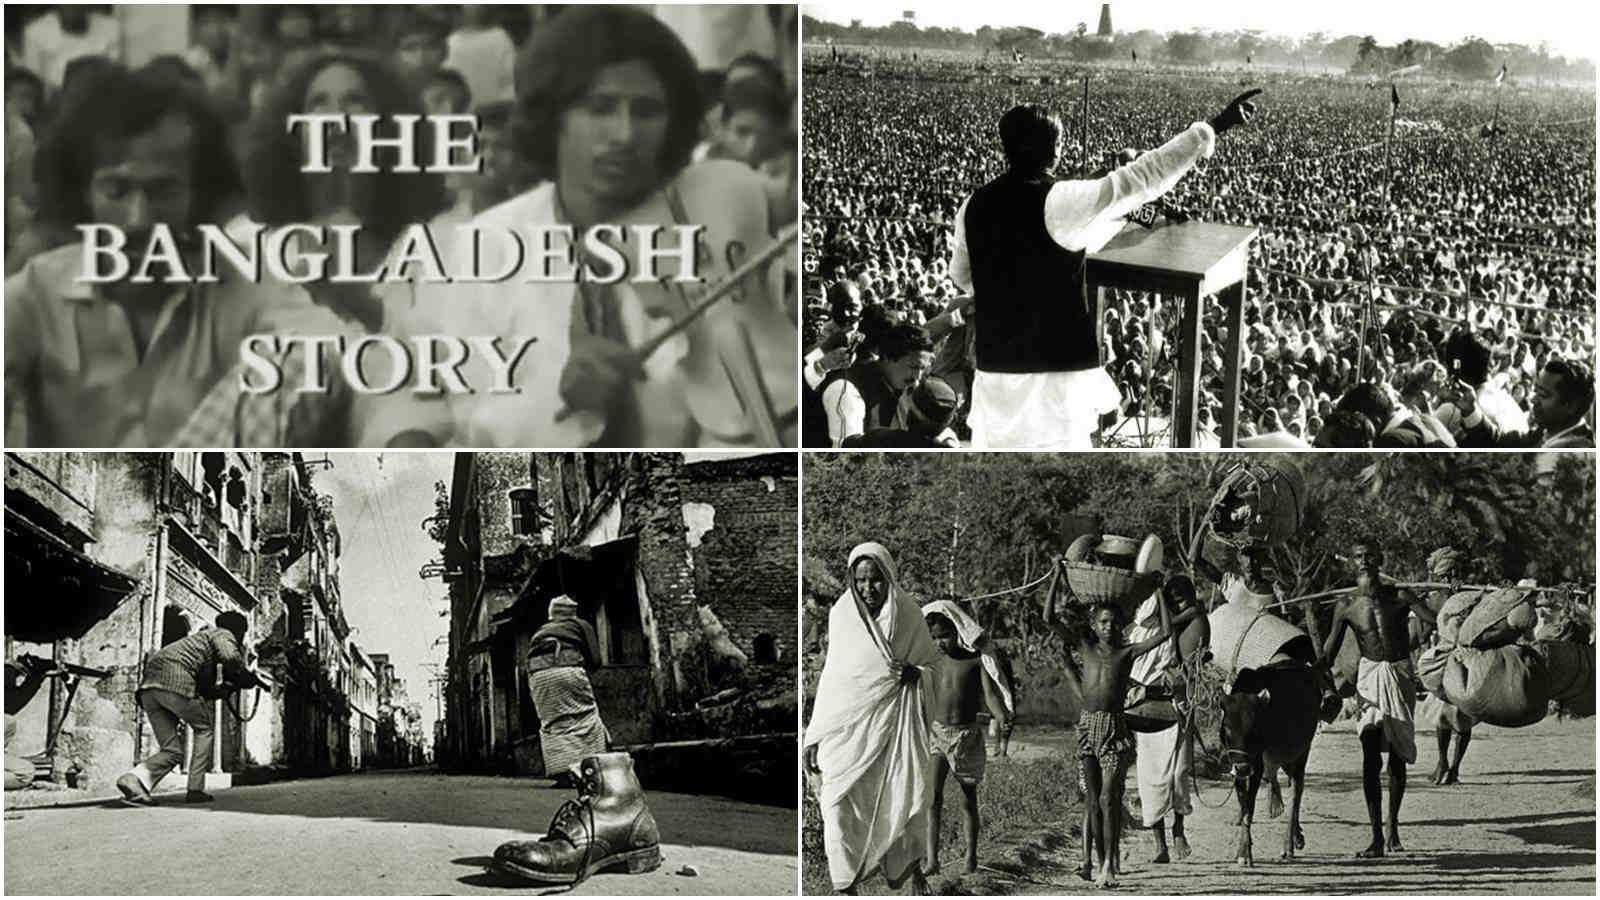 The Bangladesh Story - a documentary on Bangladesh